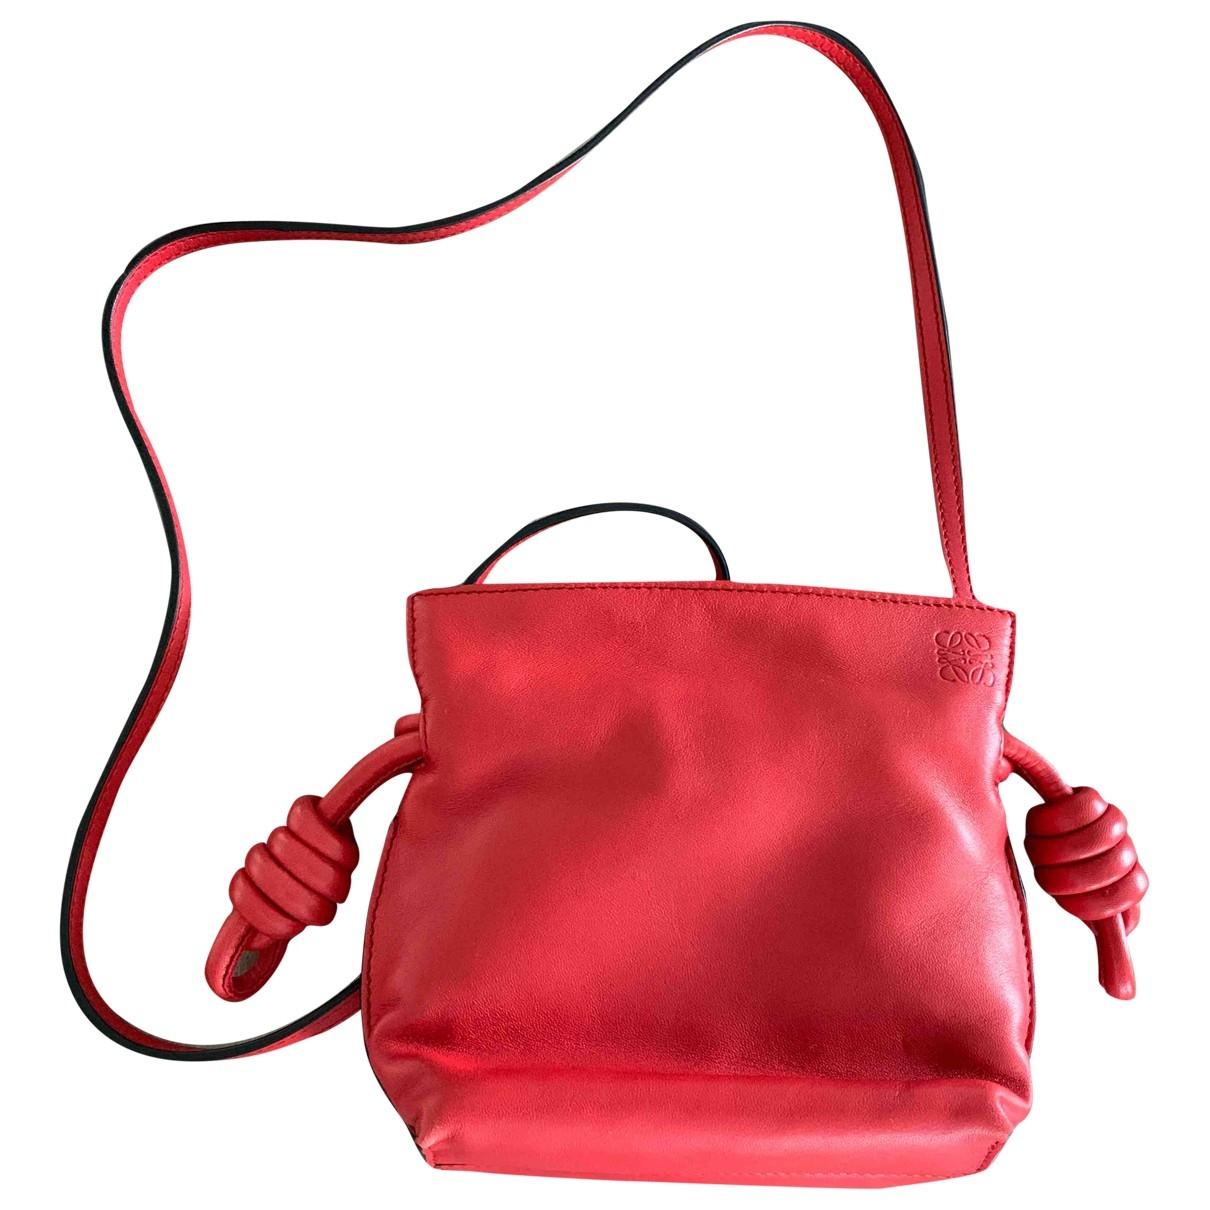 Loewe Flamenco Red Leather handbag for Women \N